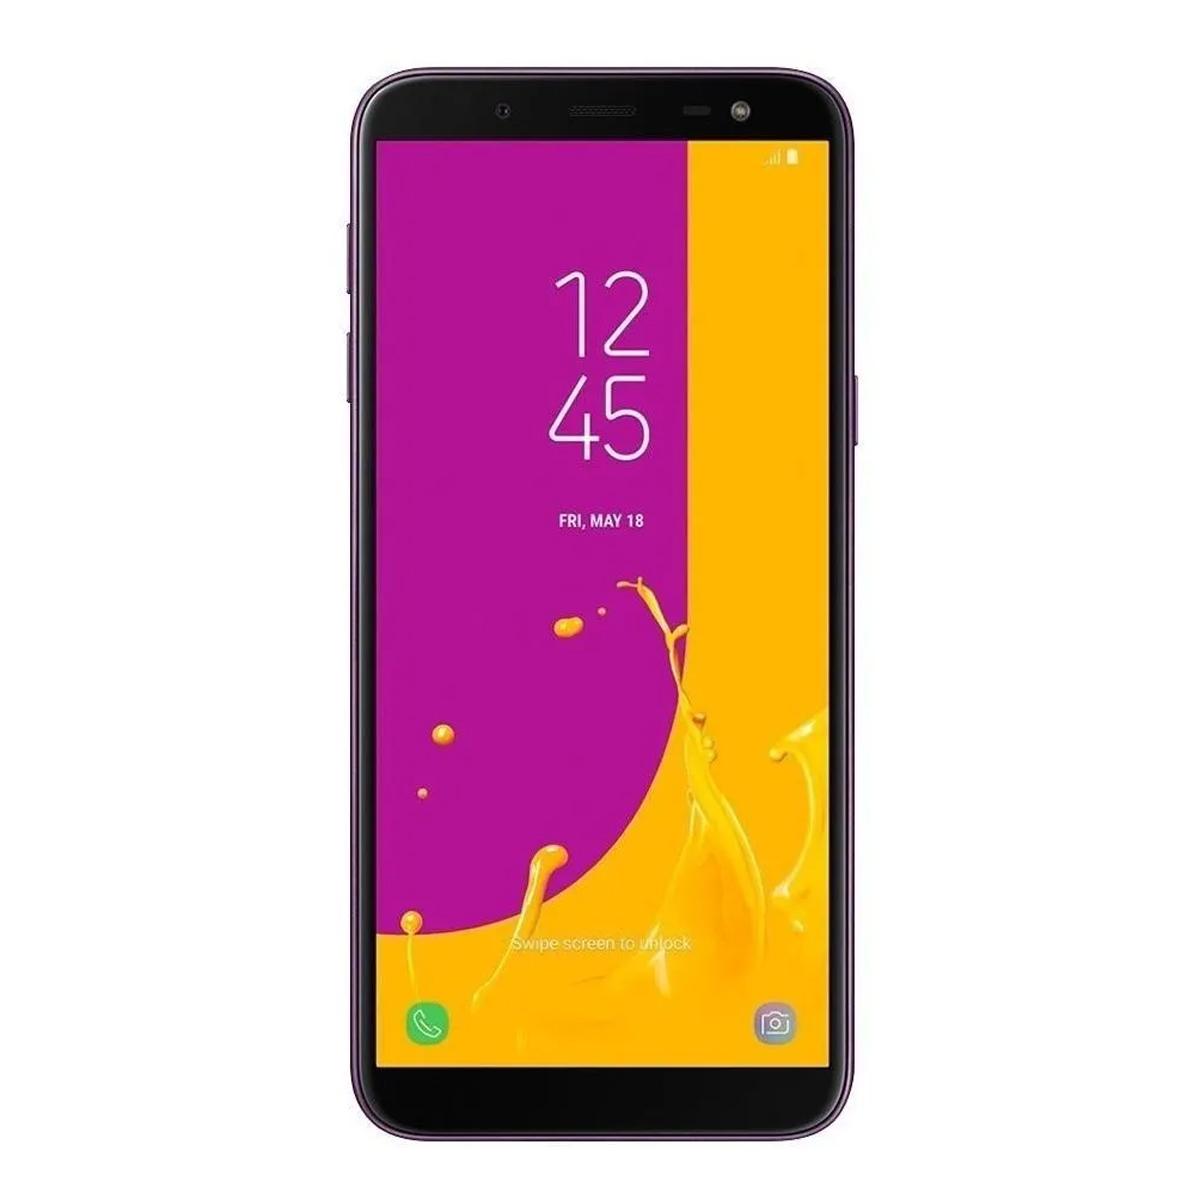 Samsung Galaxy J6 Tv J600 32gb Tela 5.6 2gb Ram - Revisado